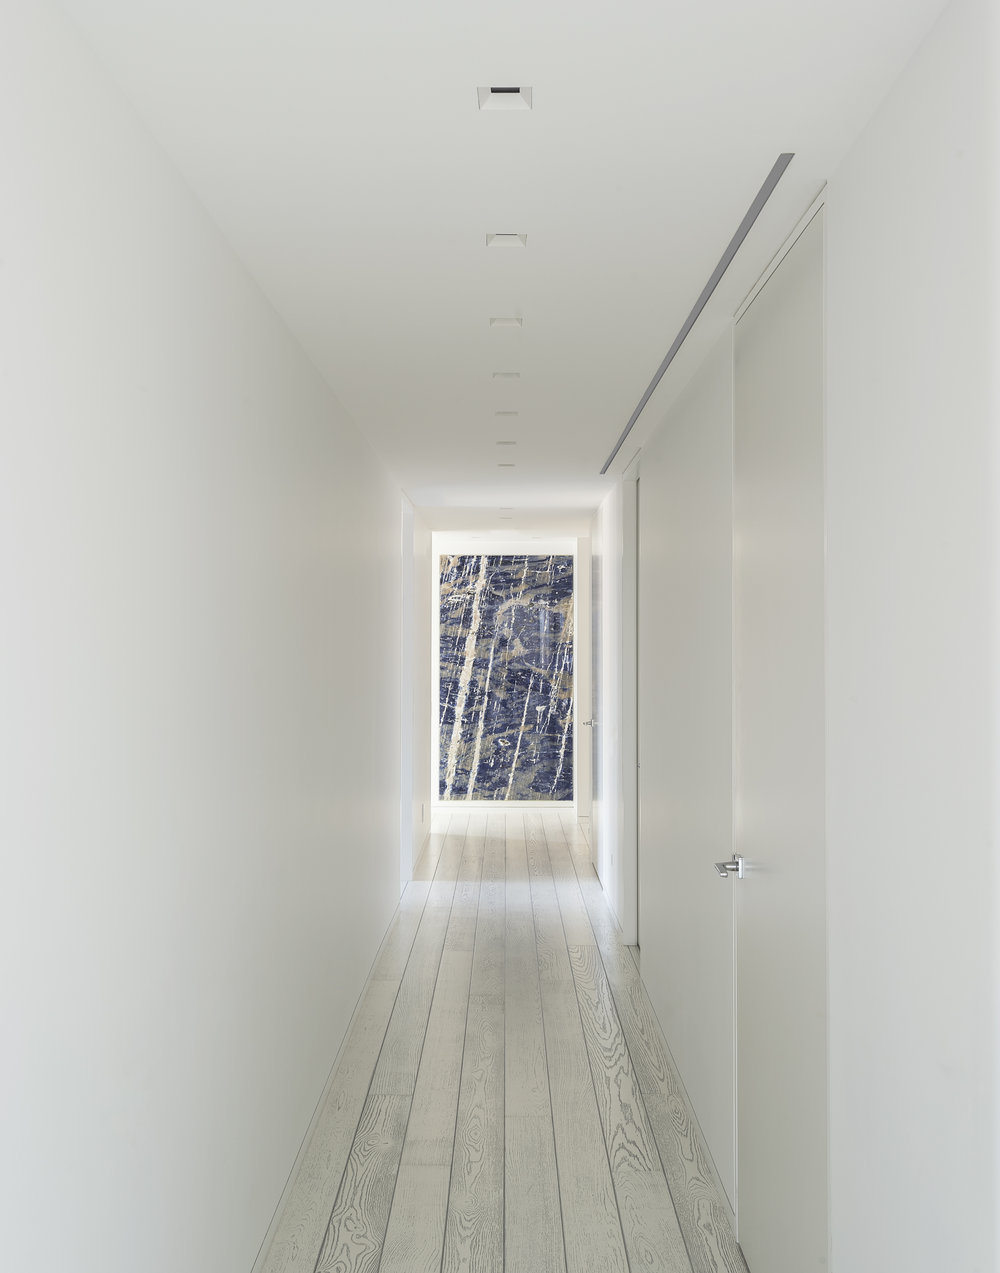 East 77th Street Apartment Hallway